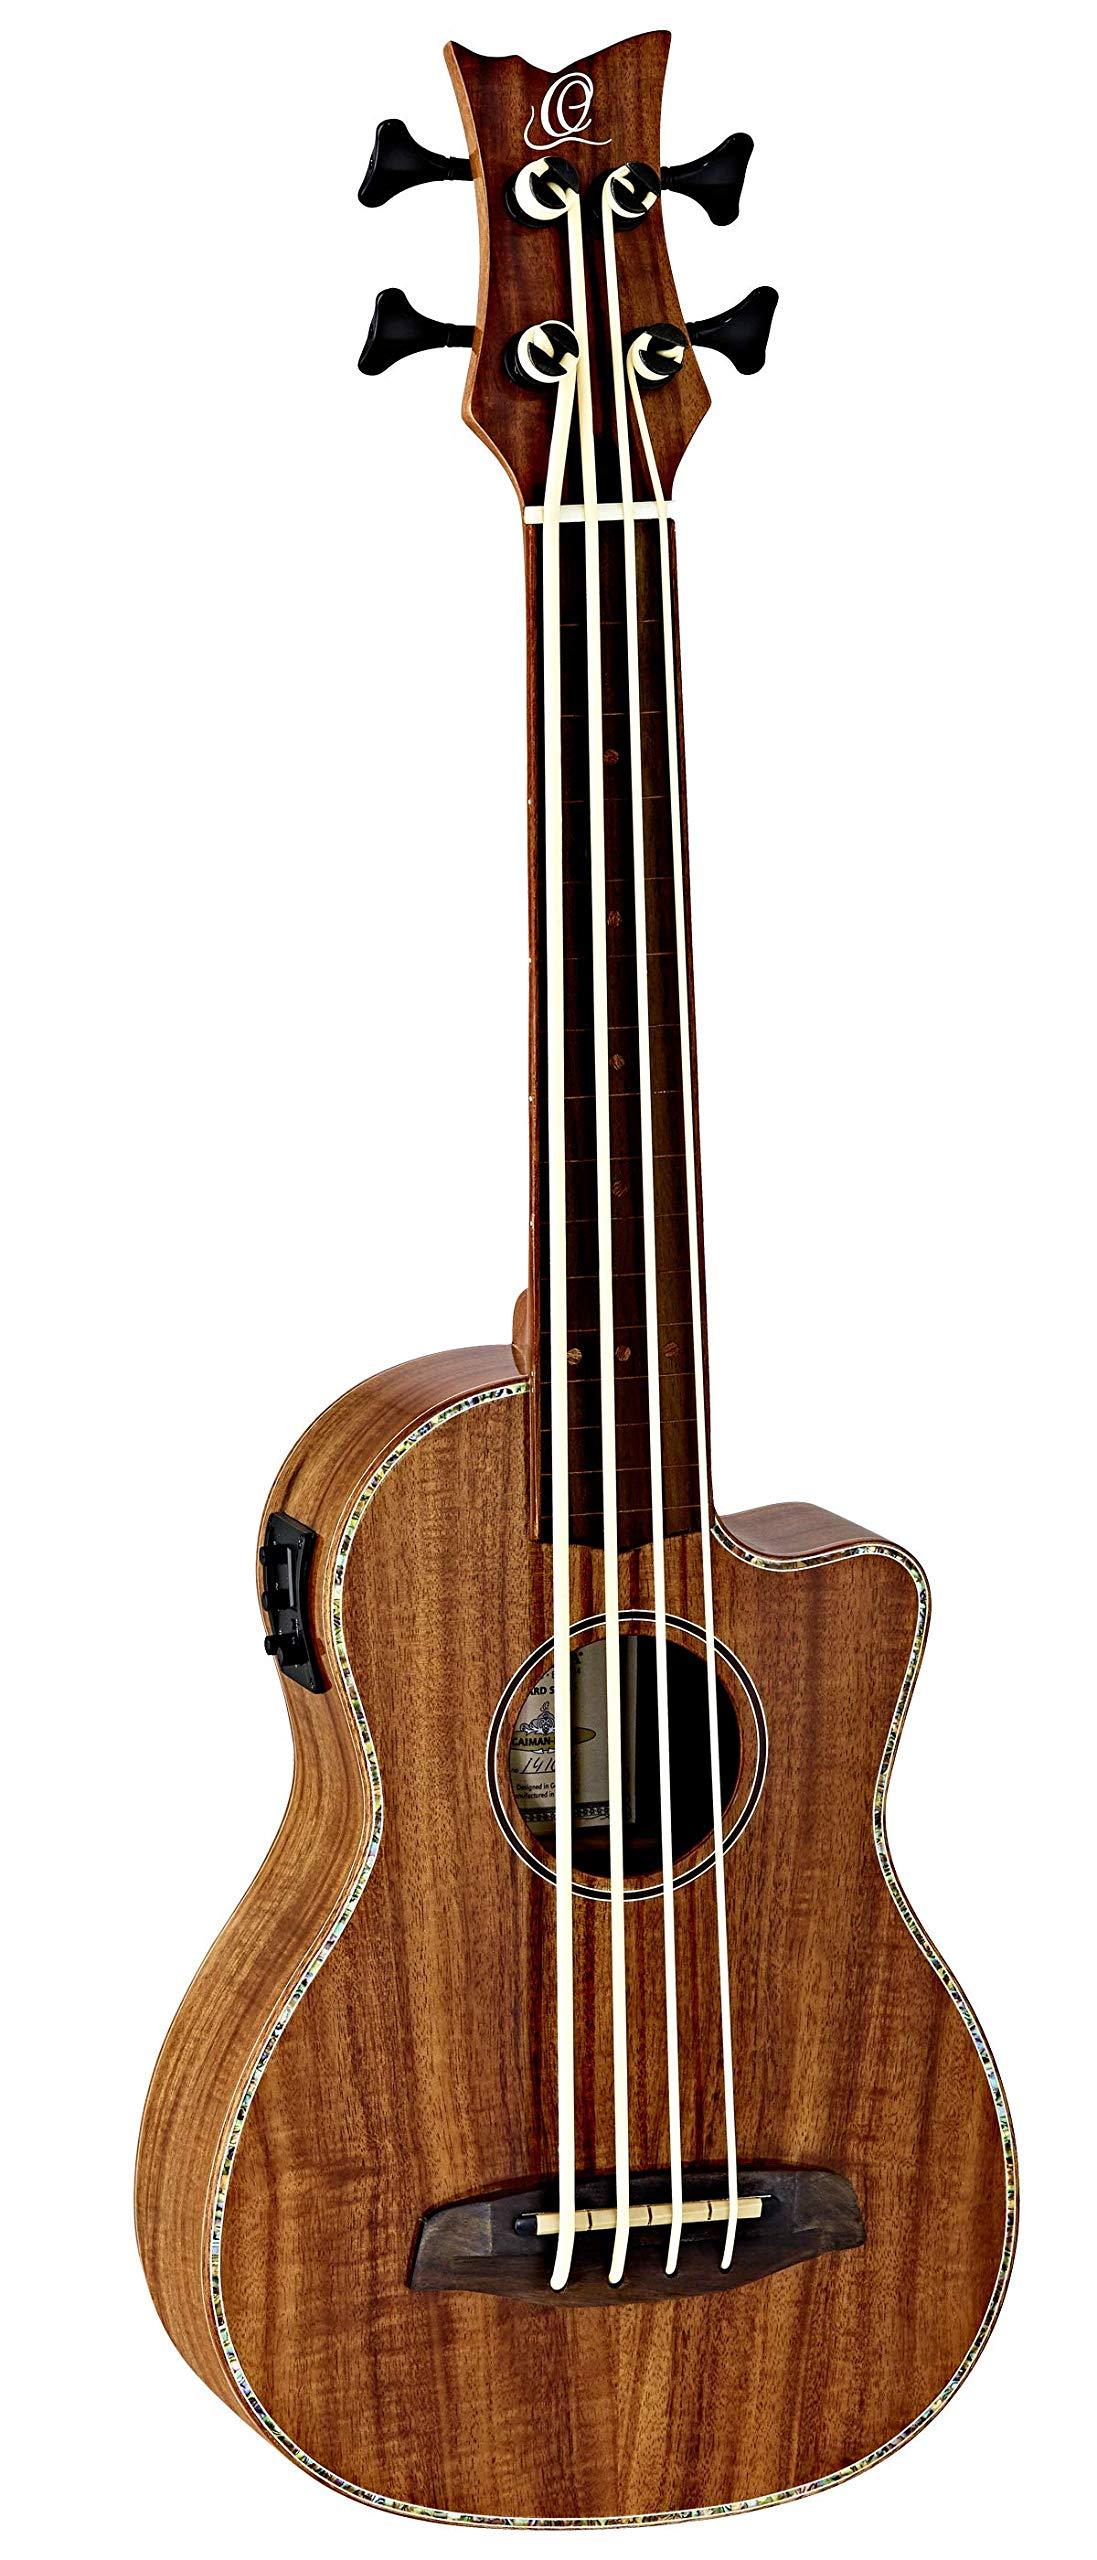 Ortega Guitars 4 String Caiman-FL-GB Lizard Series Fretless Uke-Bass Acacia Top & Body, Cutaway & Built-in Pickup, Includes Gig Bag